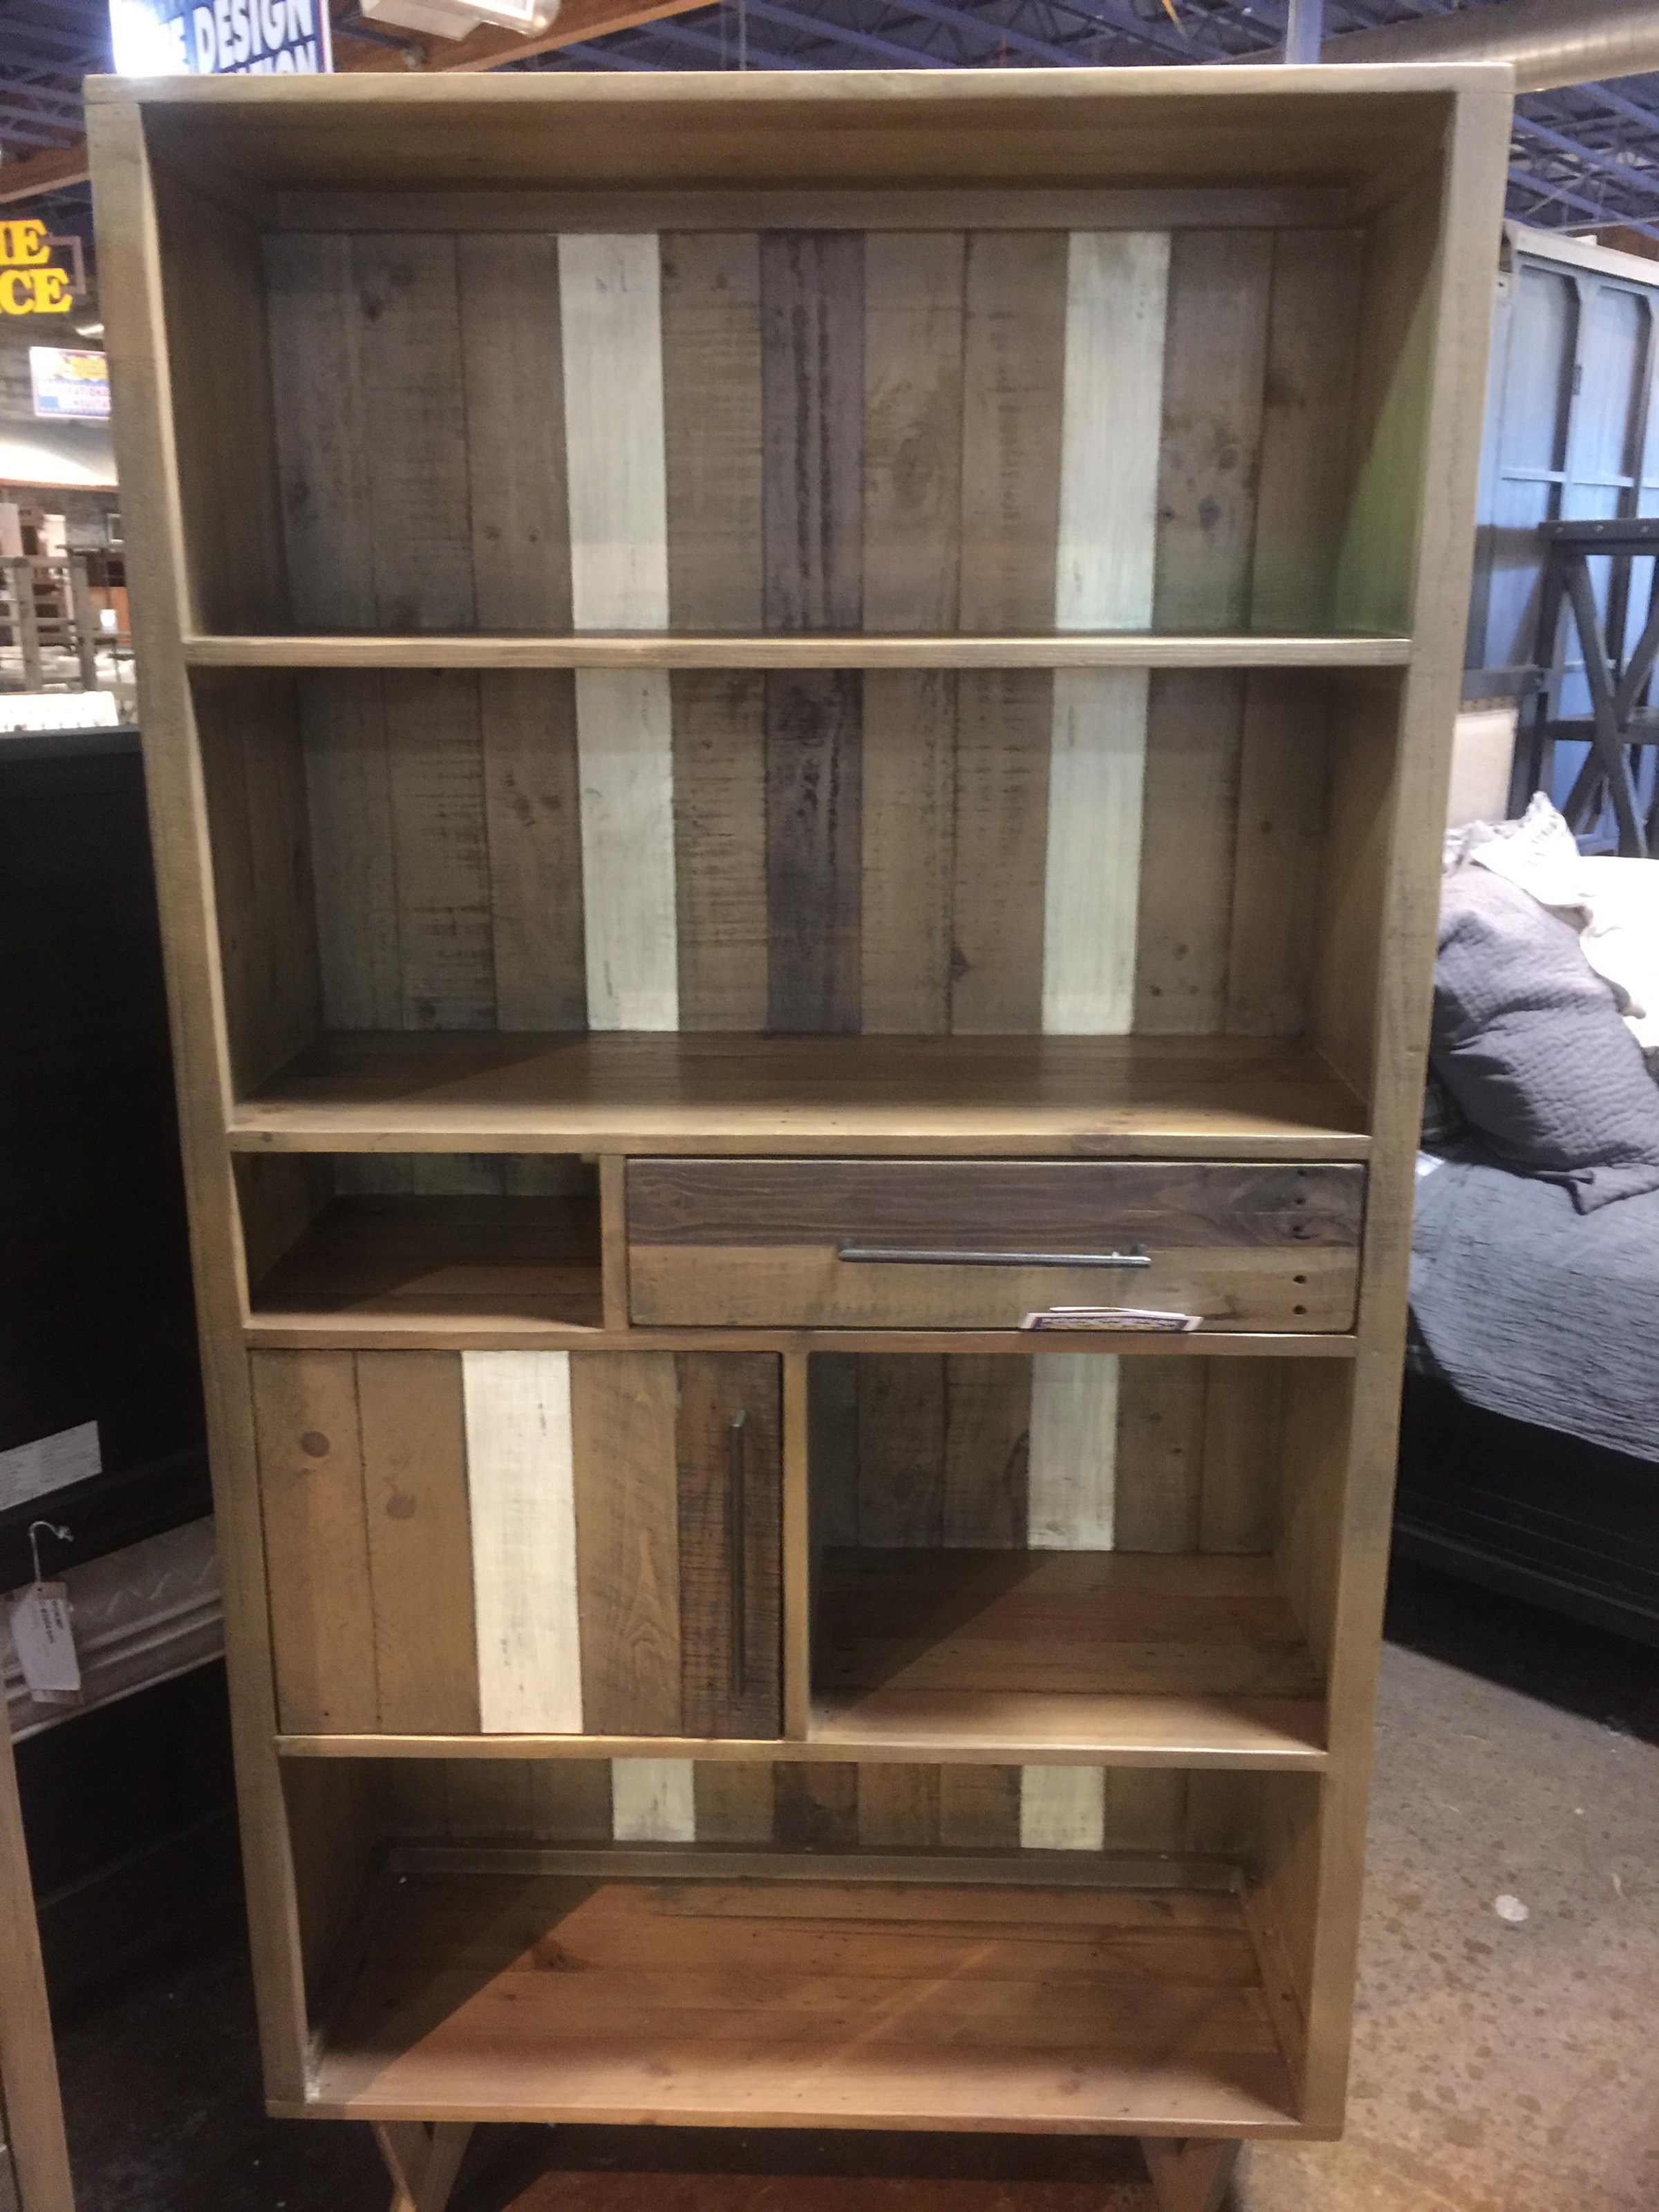 Reeds Trading Company Trestles Bookcase - Item Number: Trestles Bookcase